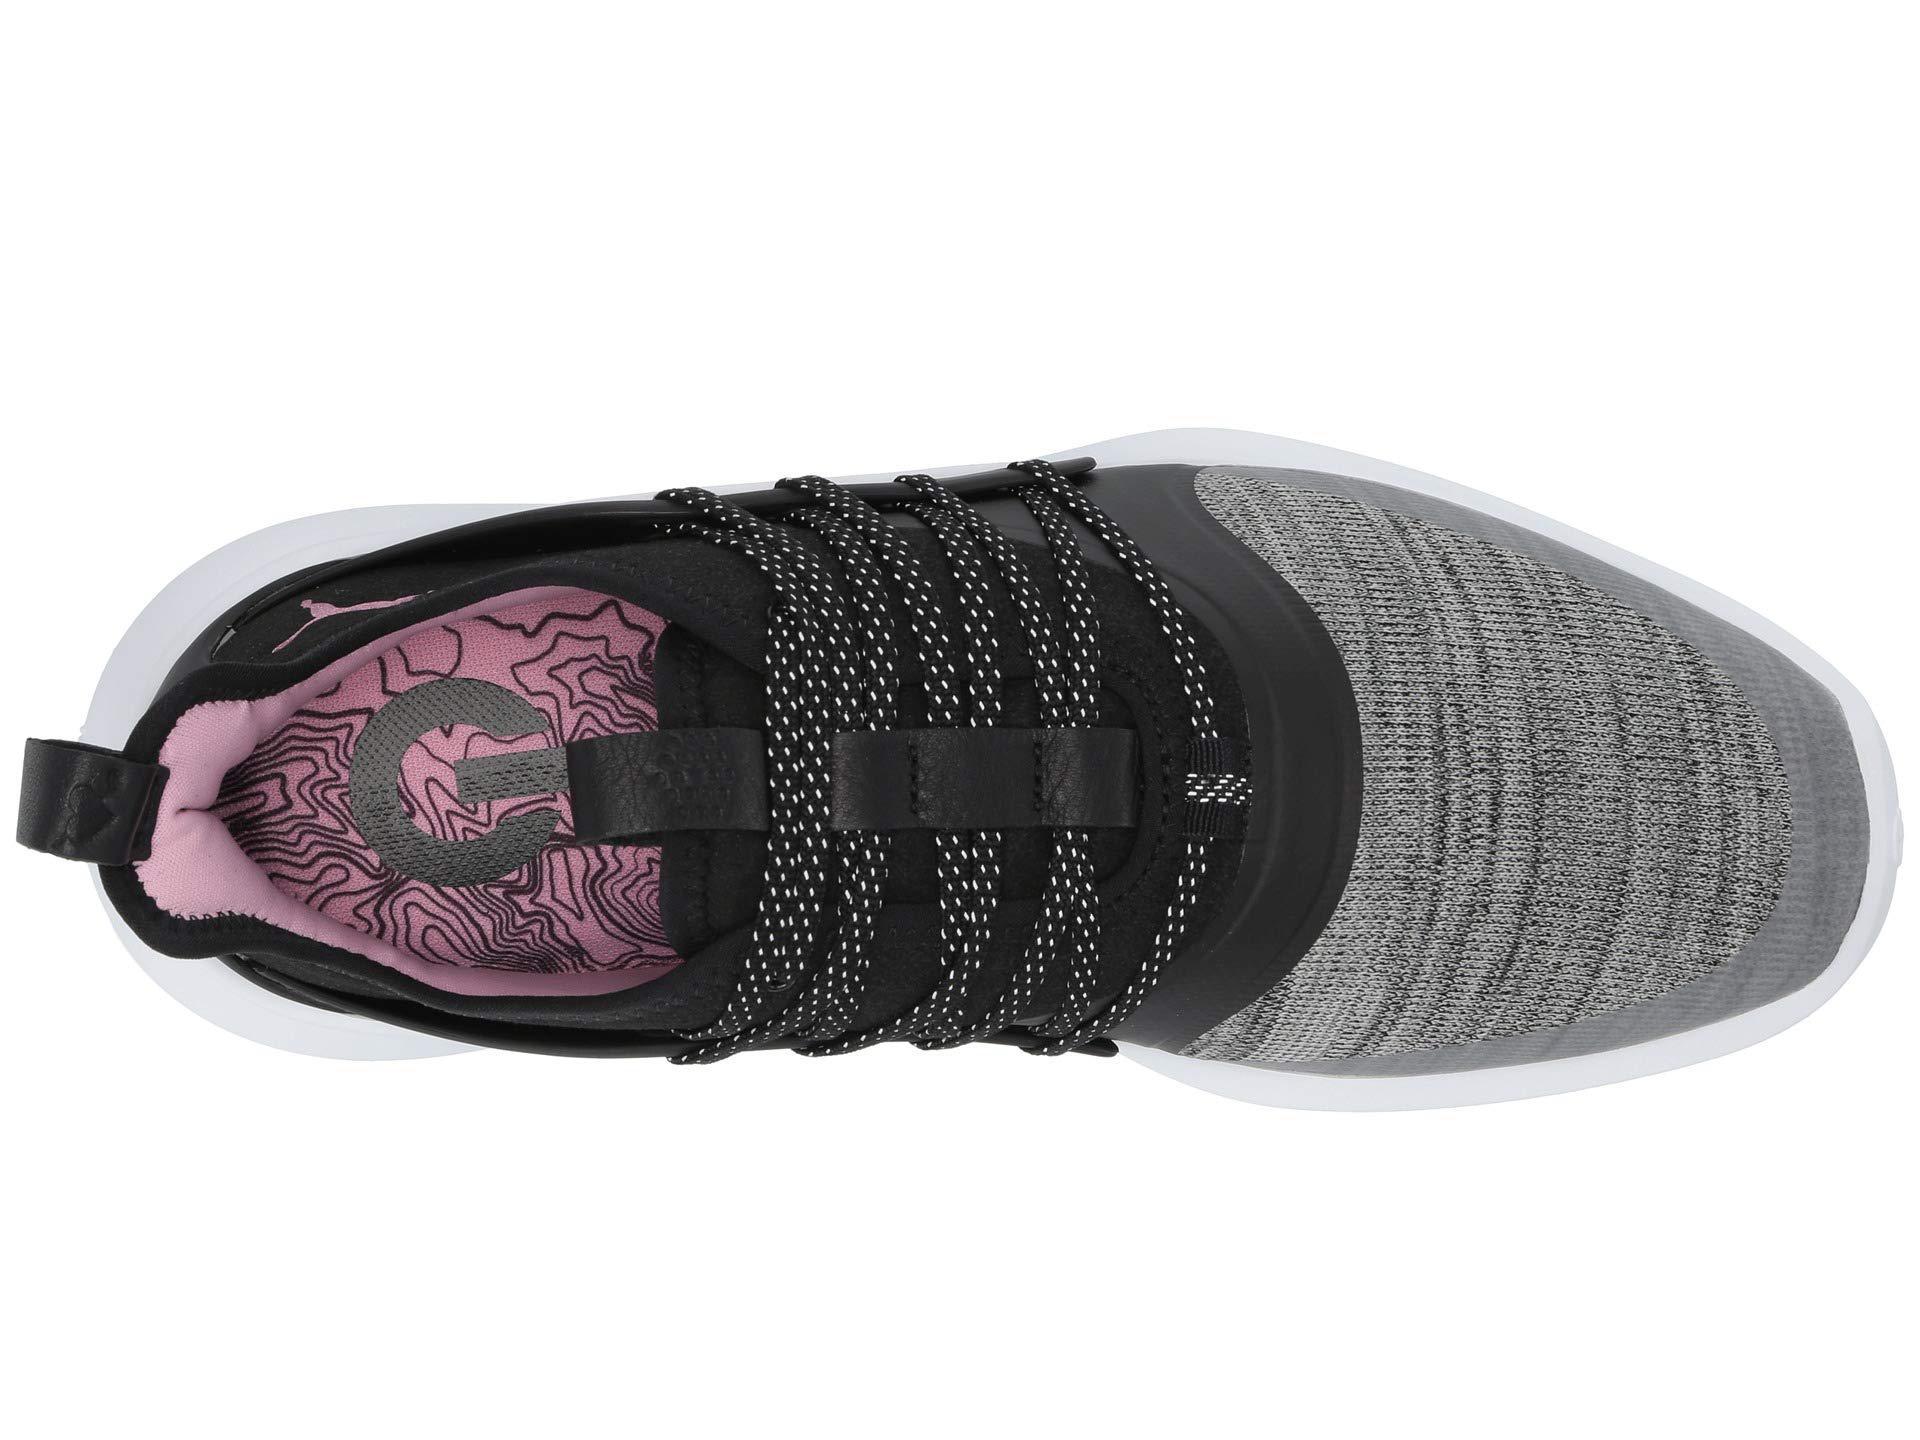 8a01f966c3a PUMA - Multicolor Ignite Nxt Solelace (black metallic Pink) Women s Golf  Shoes -. View fullscreen